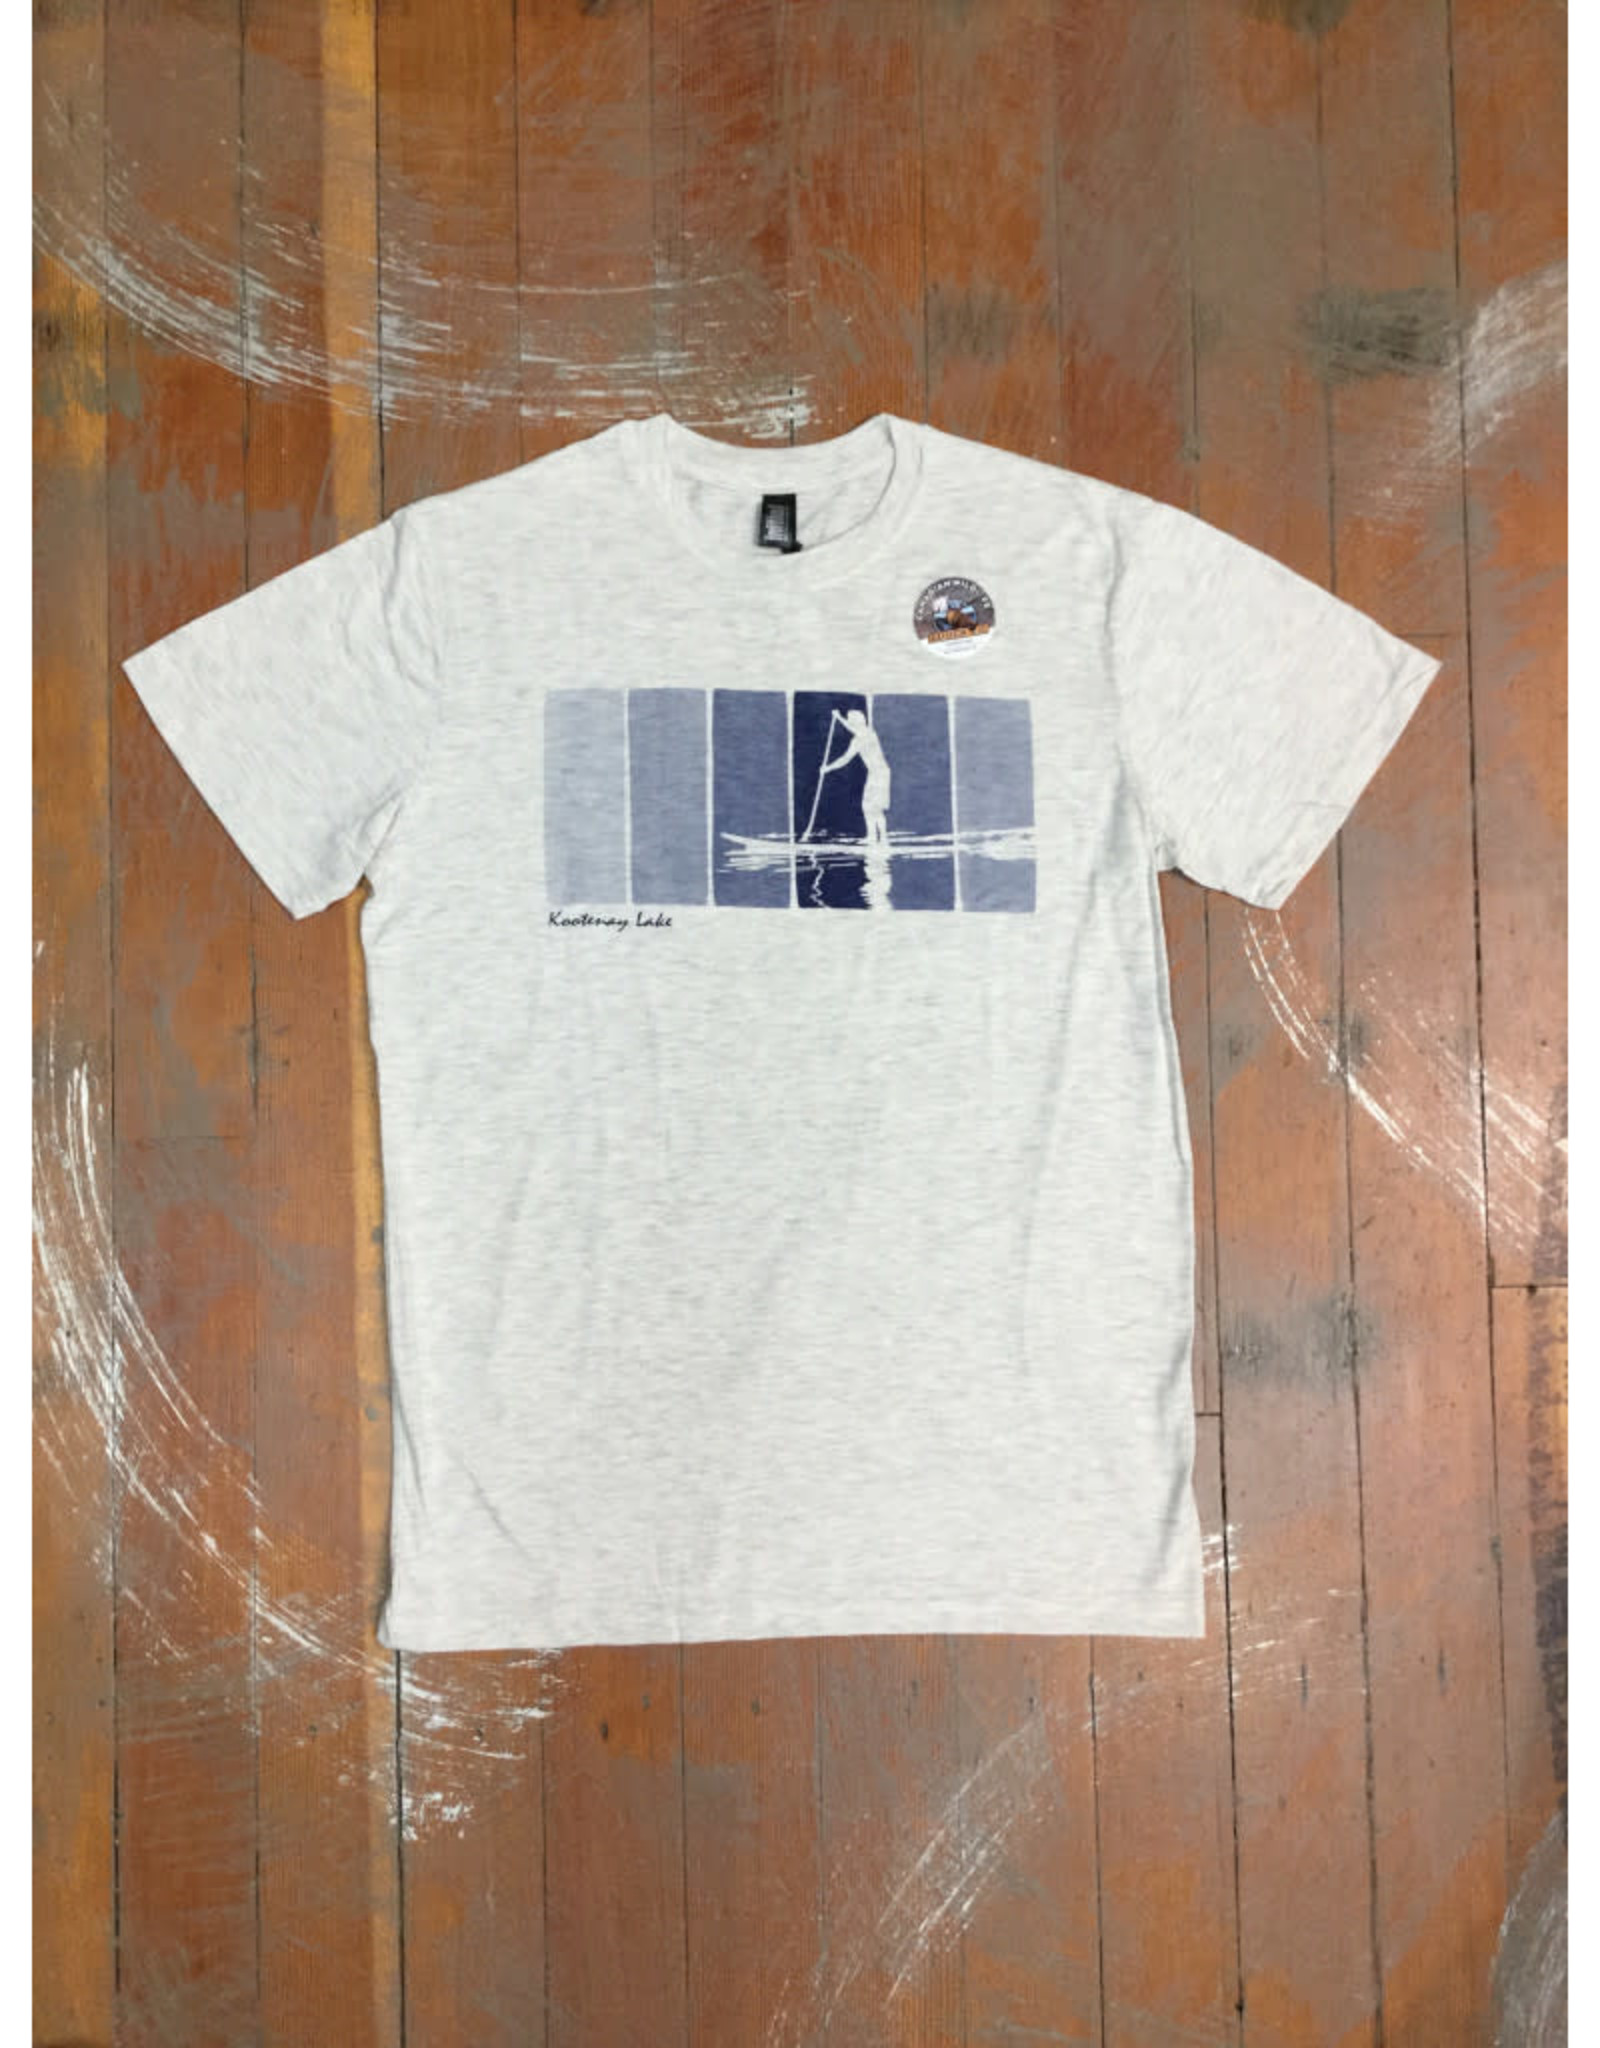 Attraction Paddle Reflection Souvenir T-Shirt